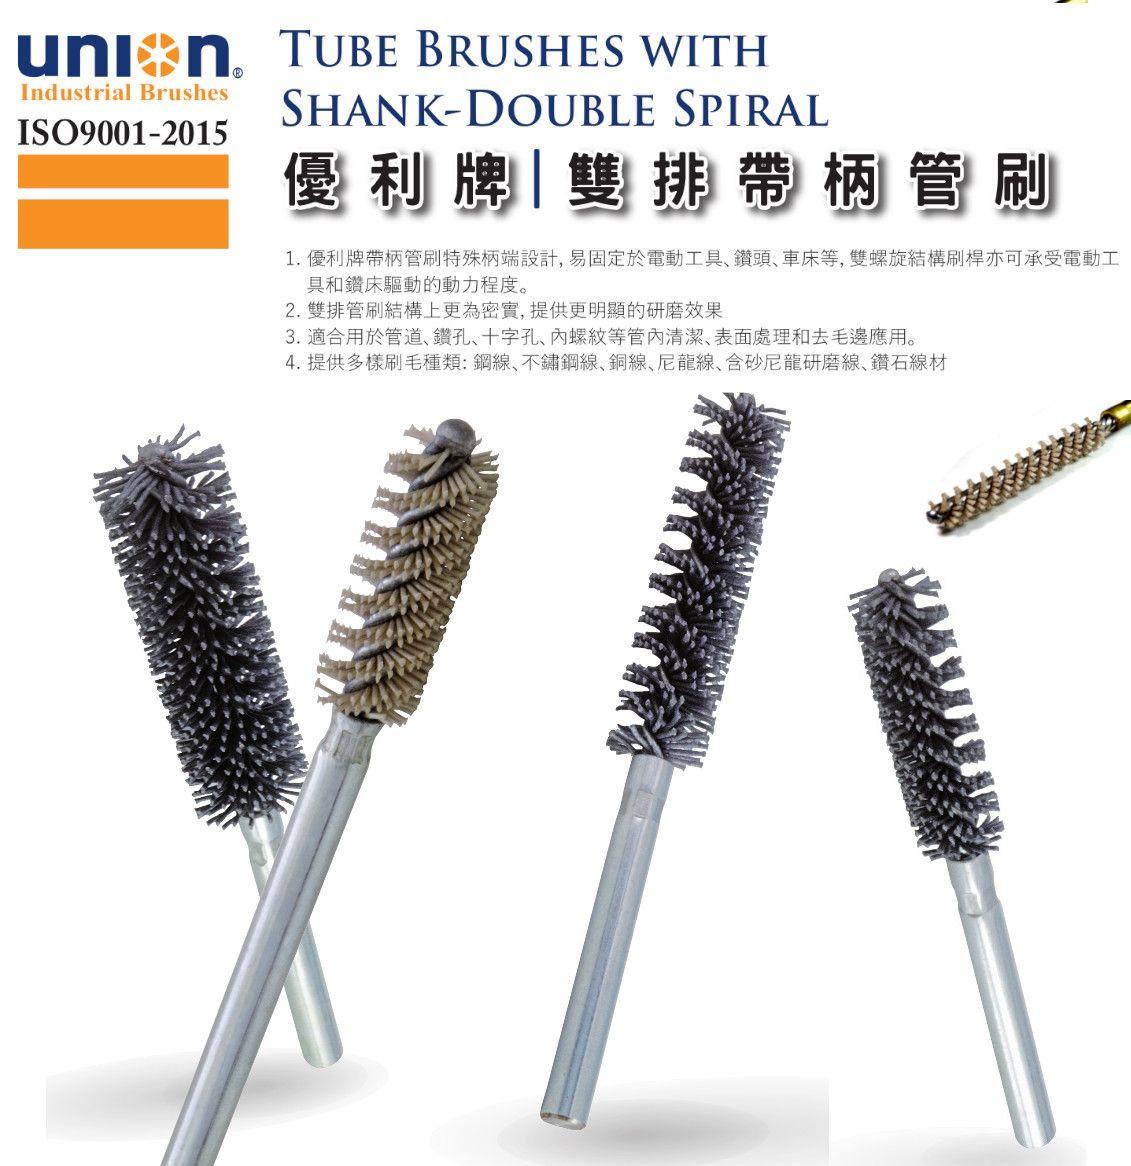 Tube Brushes with Shank-Double Spiral (abrasive nylon)